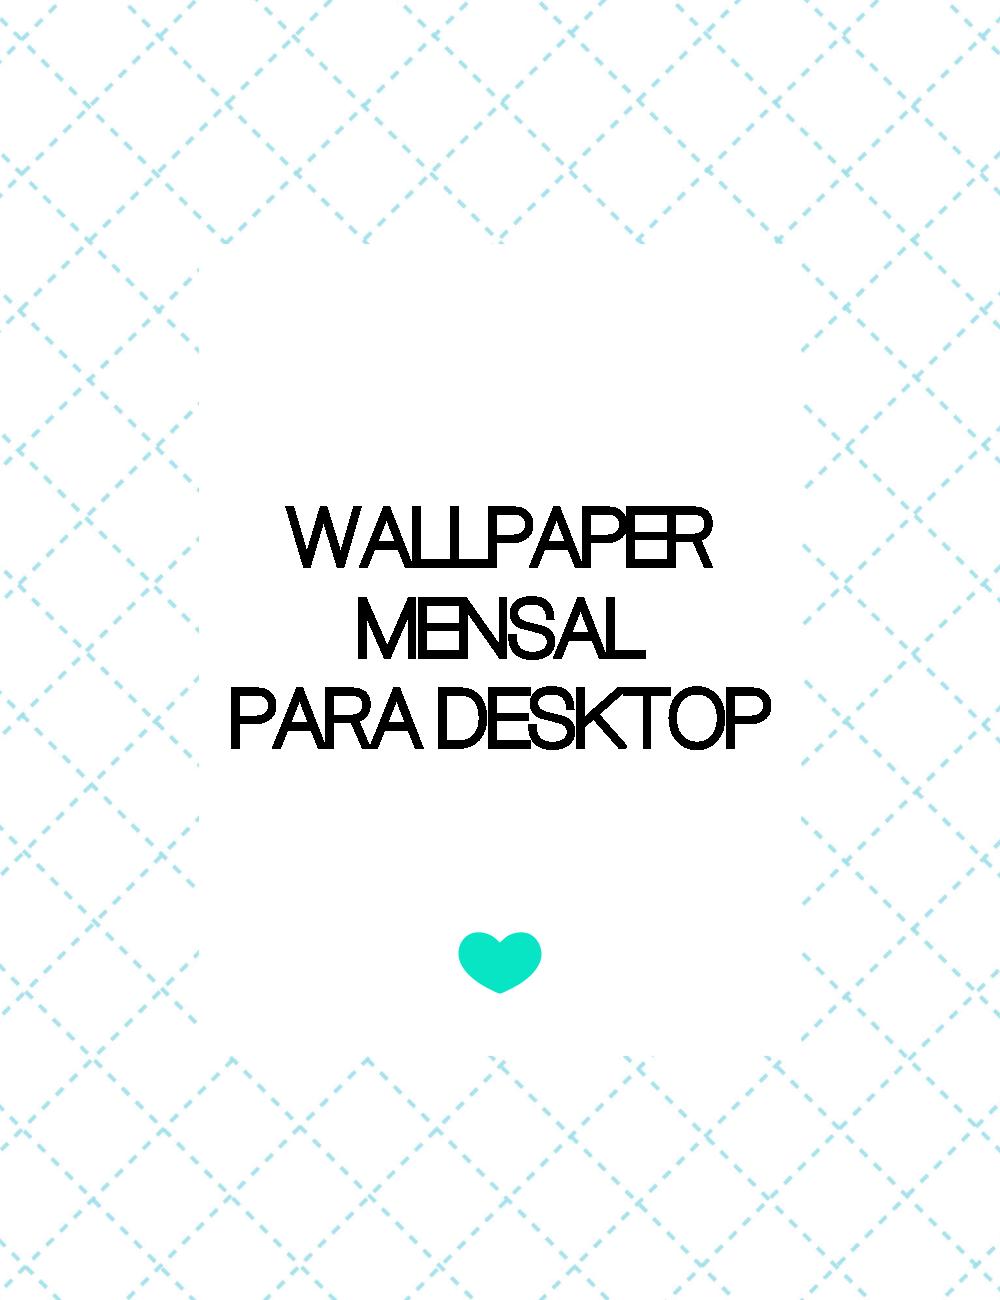 Wallpaper mensal para desktop e celular!